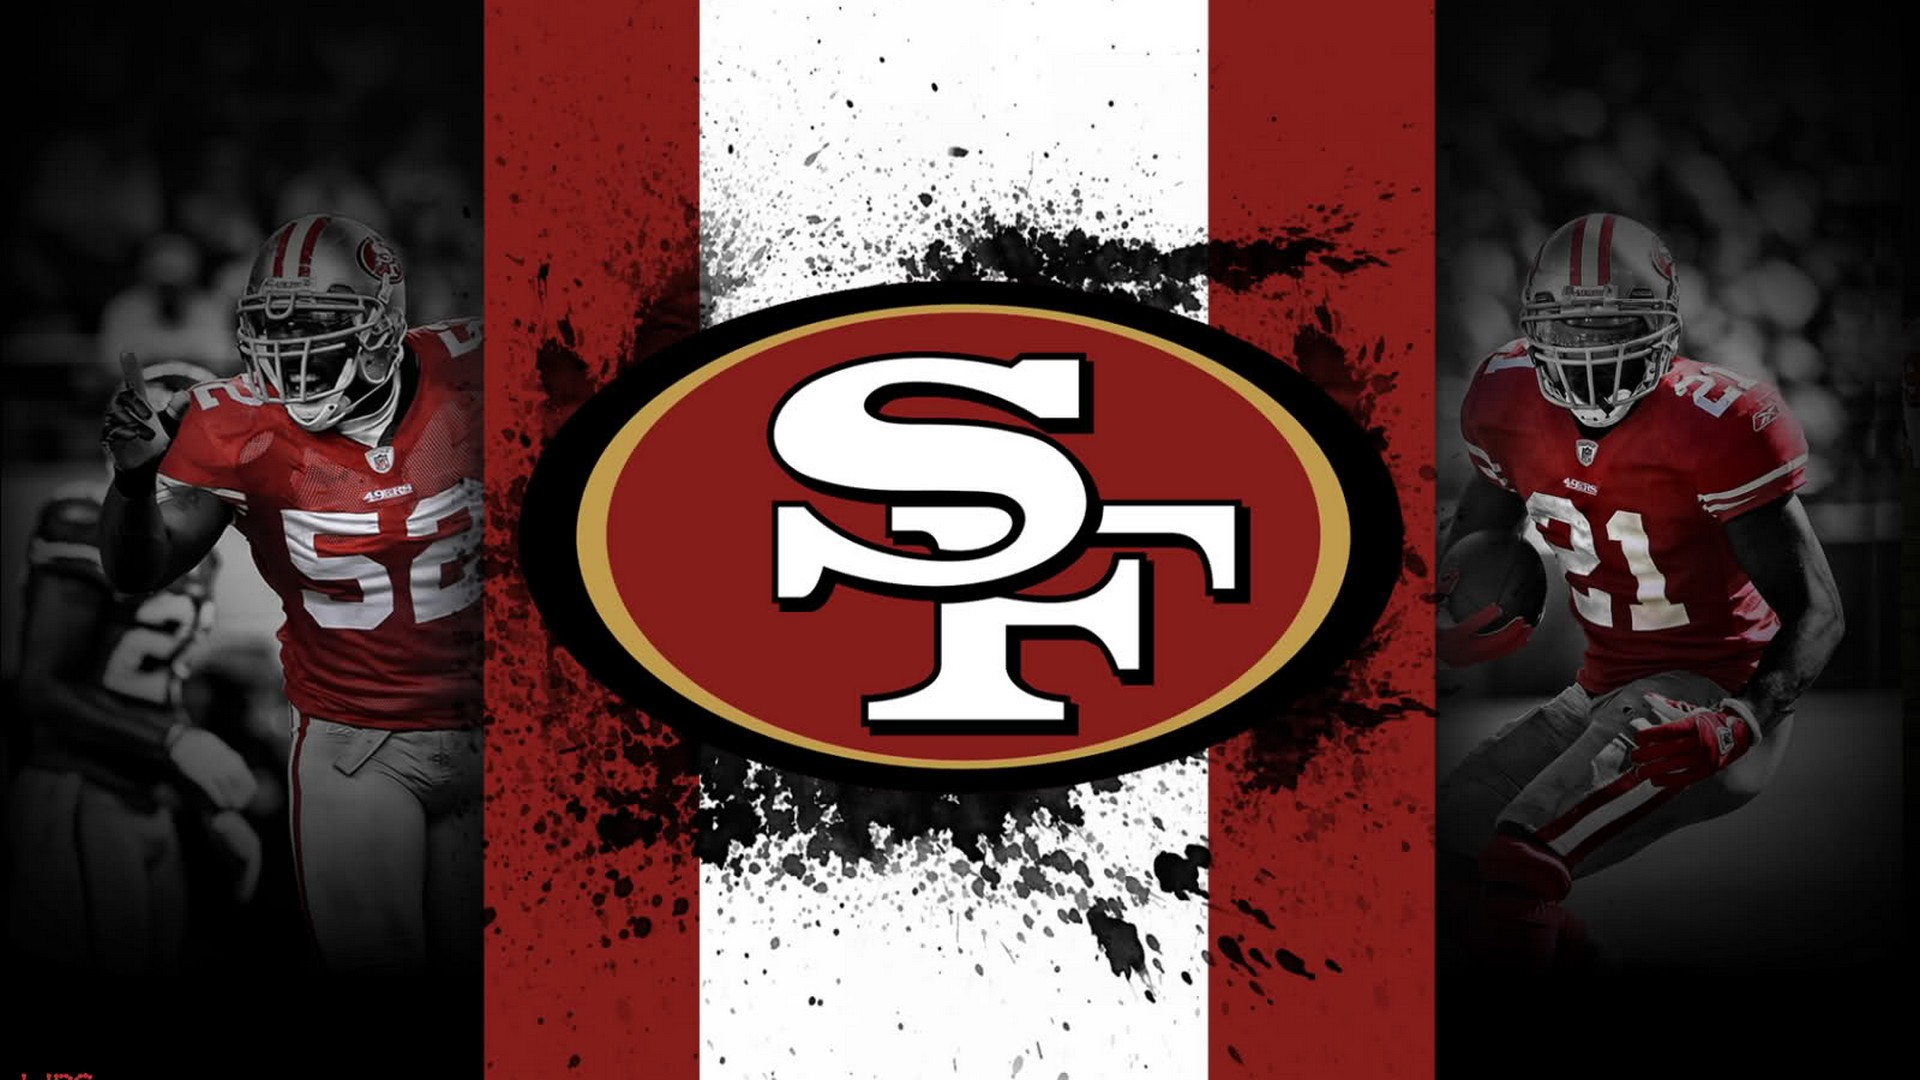 San Francisco 49ers Wallpaper 2020 NFL Football Wallpapers 1920x1080